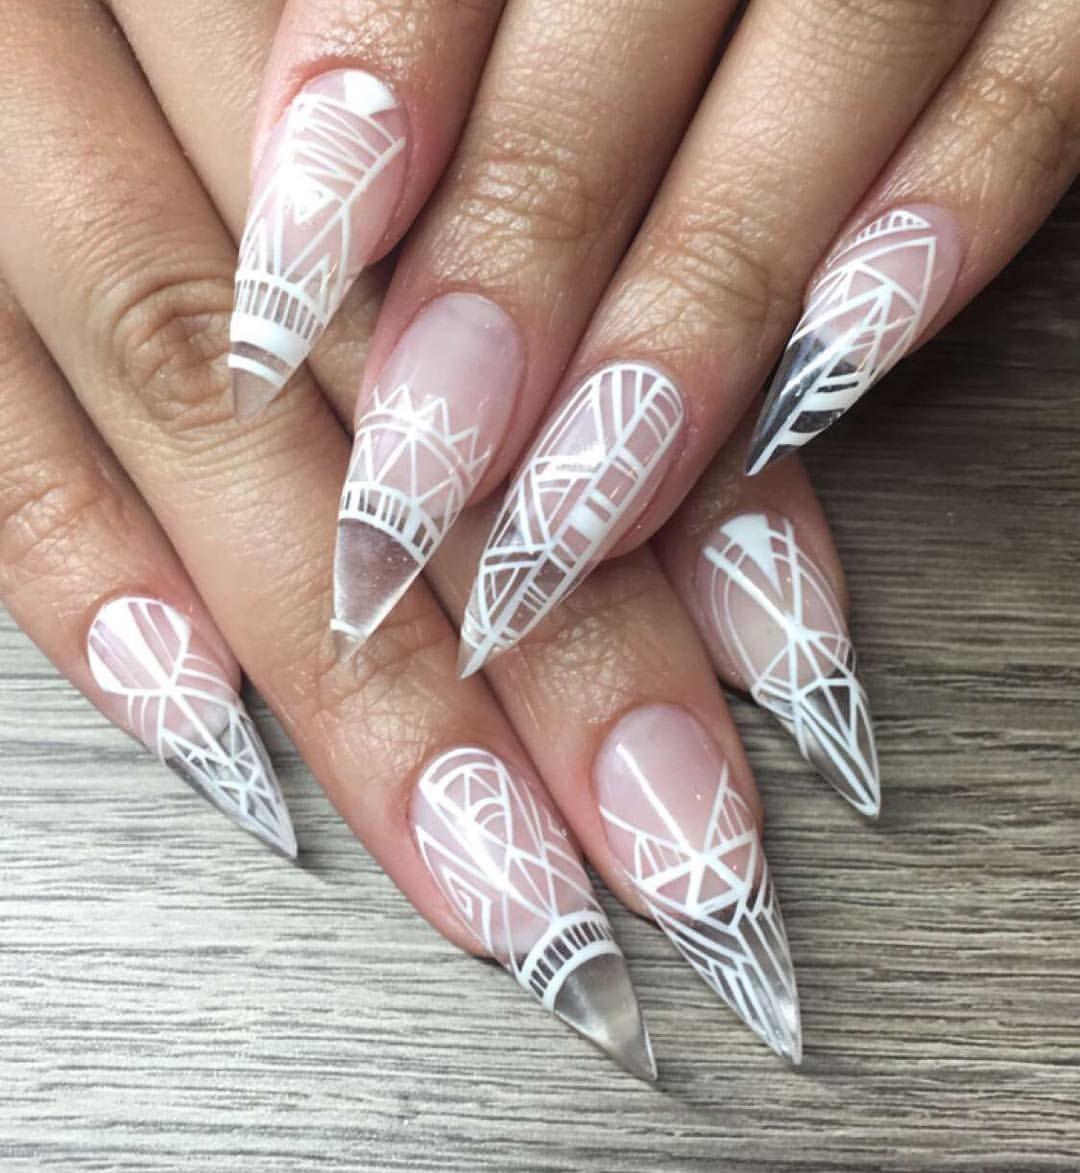 Instagram Photo By Ana Karpova Apr 21 2016 At 8 21pm Utc Clear Nail Designs Nail Designs Simple Nails